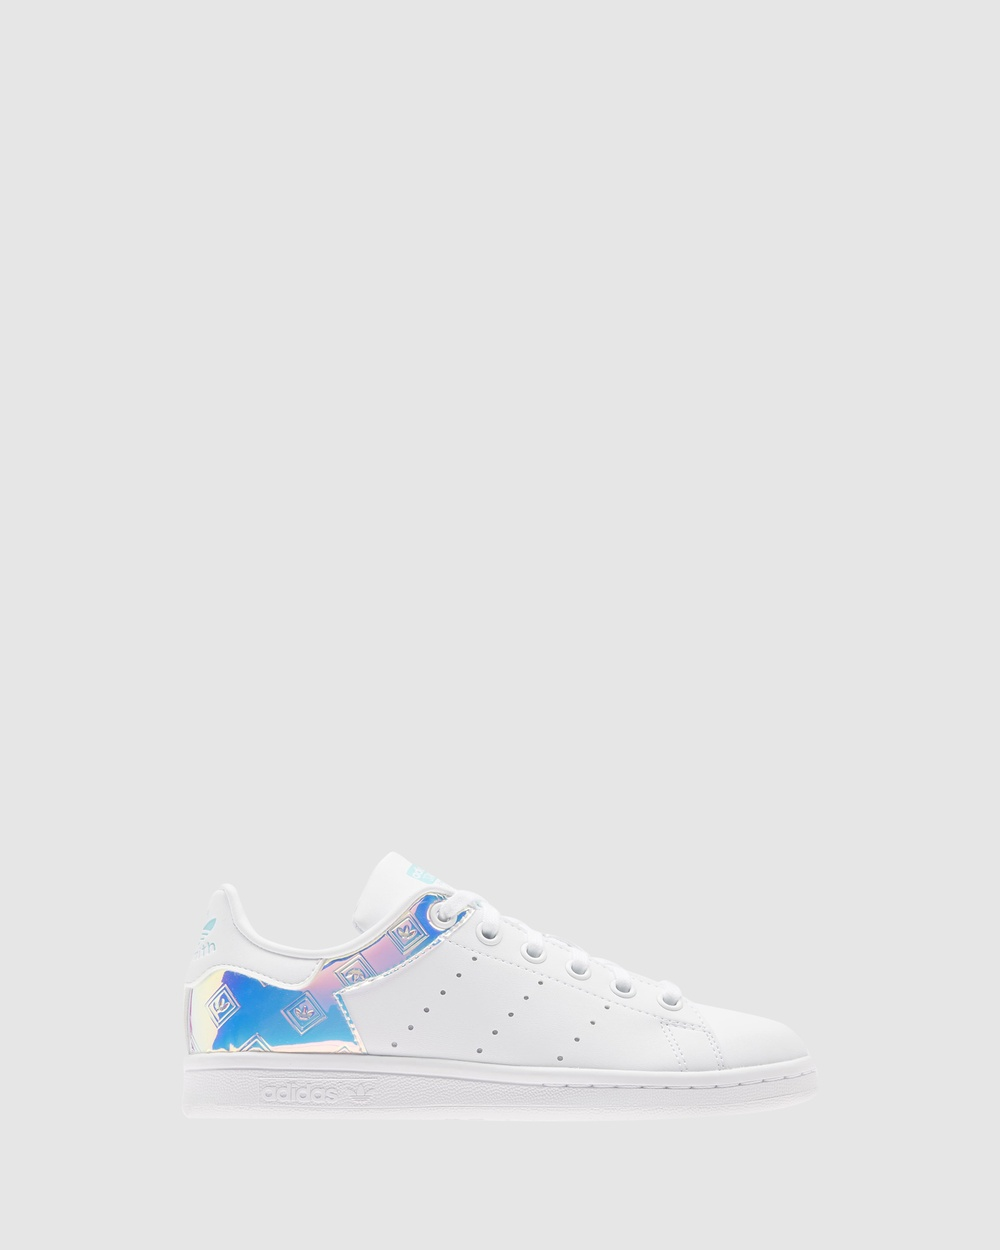 adidas Originals Stan Smith II Grade School Sneakers White/Aqua Hologram